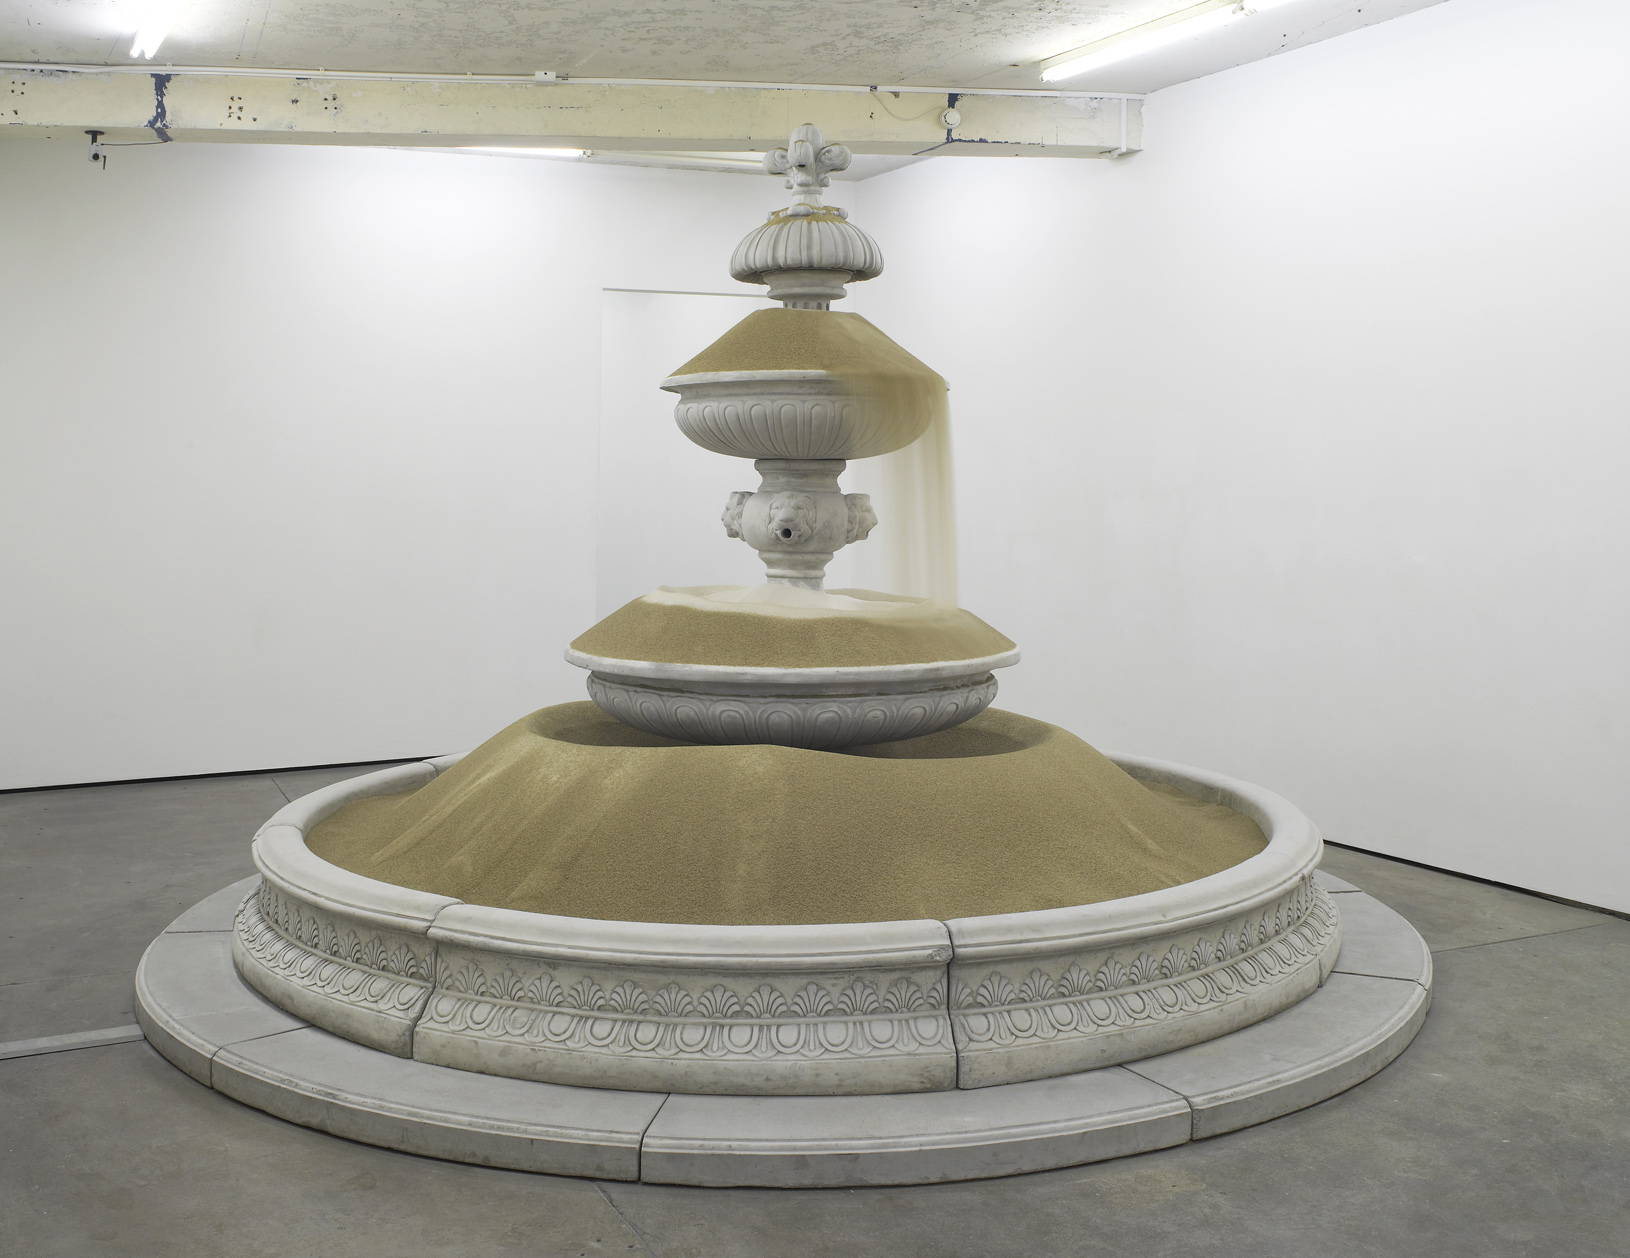 Sandfountain 2012 Prefabricated concrete fountain, sand 250 x 400 x 400 cm / 98.4 x 157.4 x 157.4 in